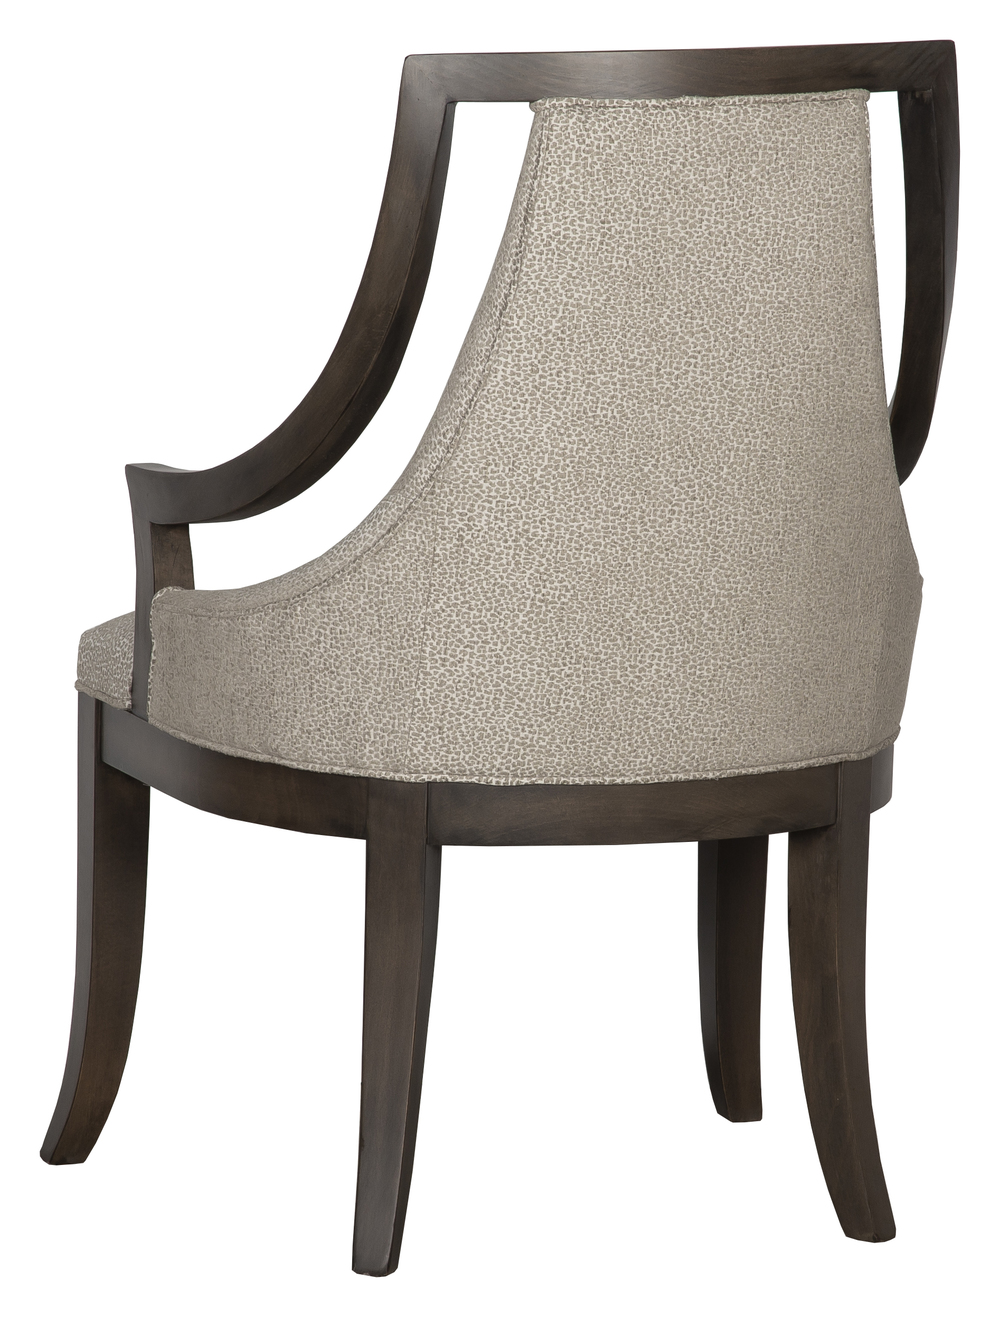 Fairfield - Caldwell Occasional Chair